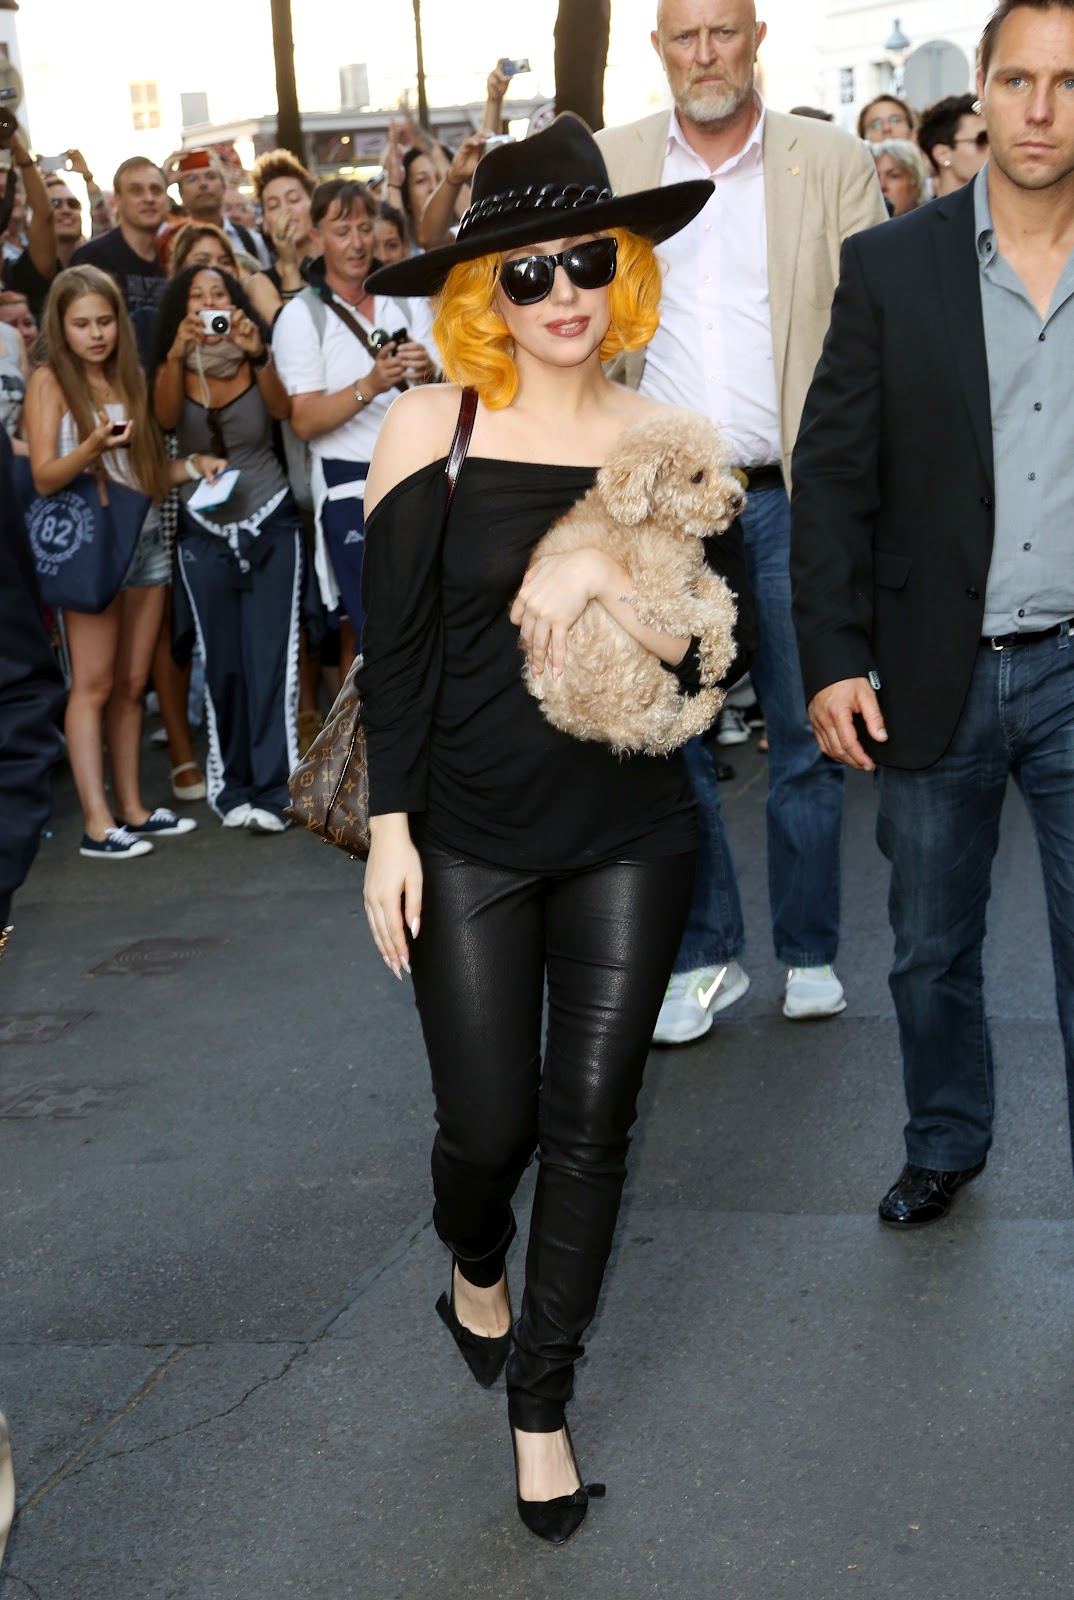 http://2.bp.blogspot.com/-A9ej67XxRpQ/UDDUxTprXKI/AAAAAAAAMIk/njMmZv_GCMs/s1600/Lady+Gaga++Arrives+in+Vienna,+August+17th+2012-01.JPG